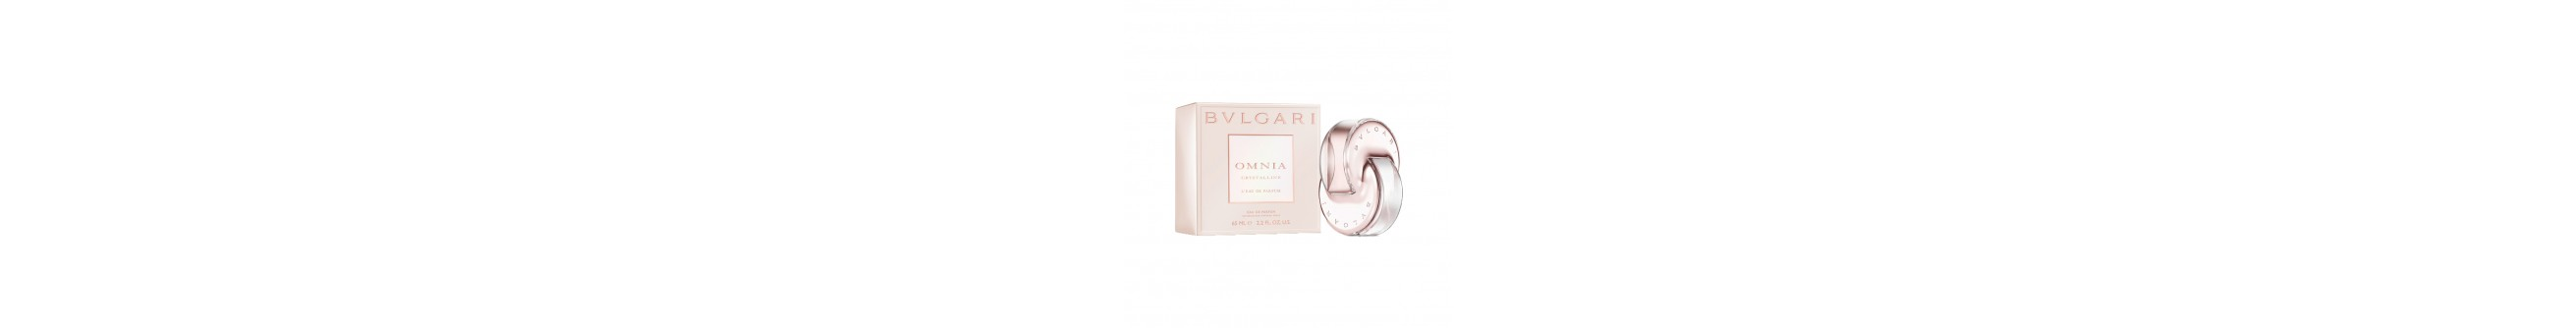 Omnia Crystalline - Bvlgari (άρωμα τύπου)